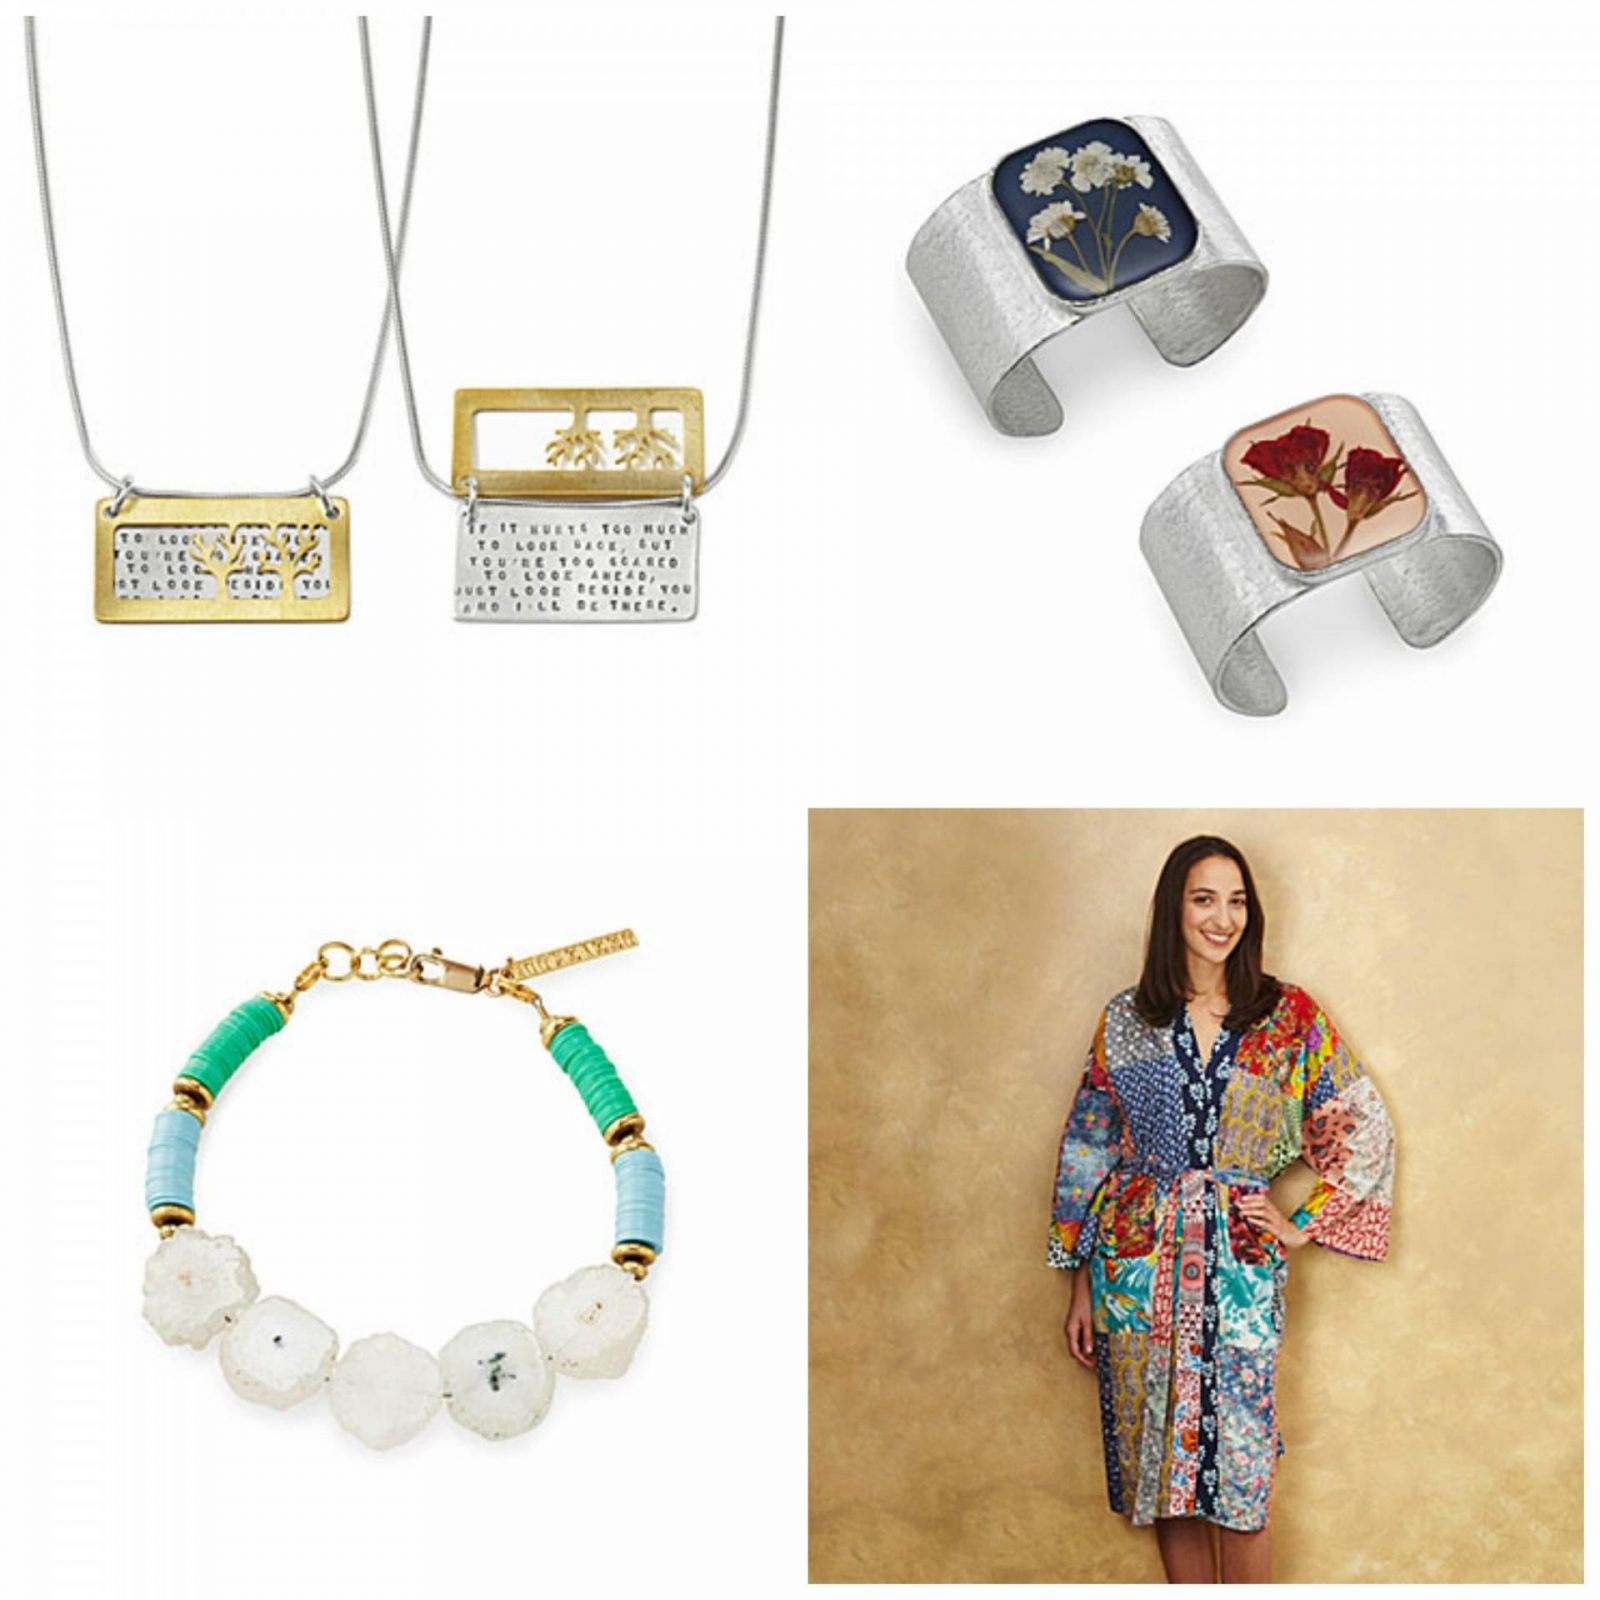 Uncommon Goods unique gift ideas for bridesmaids